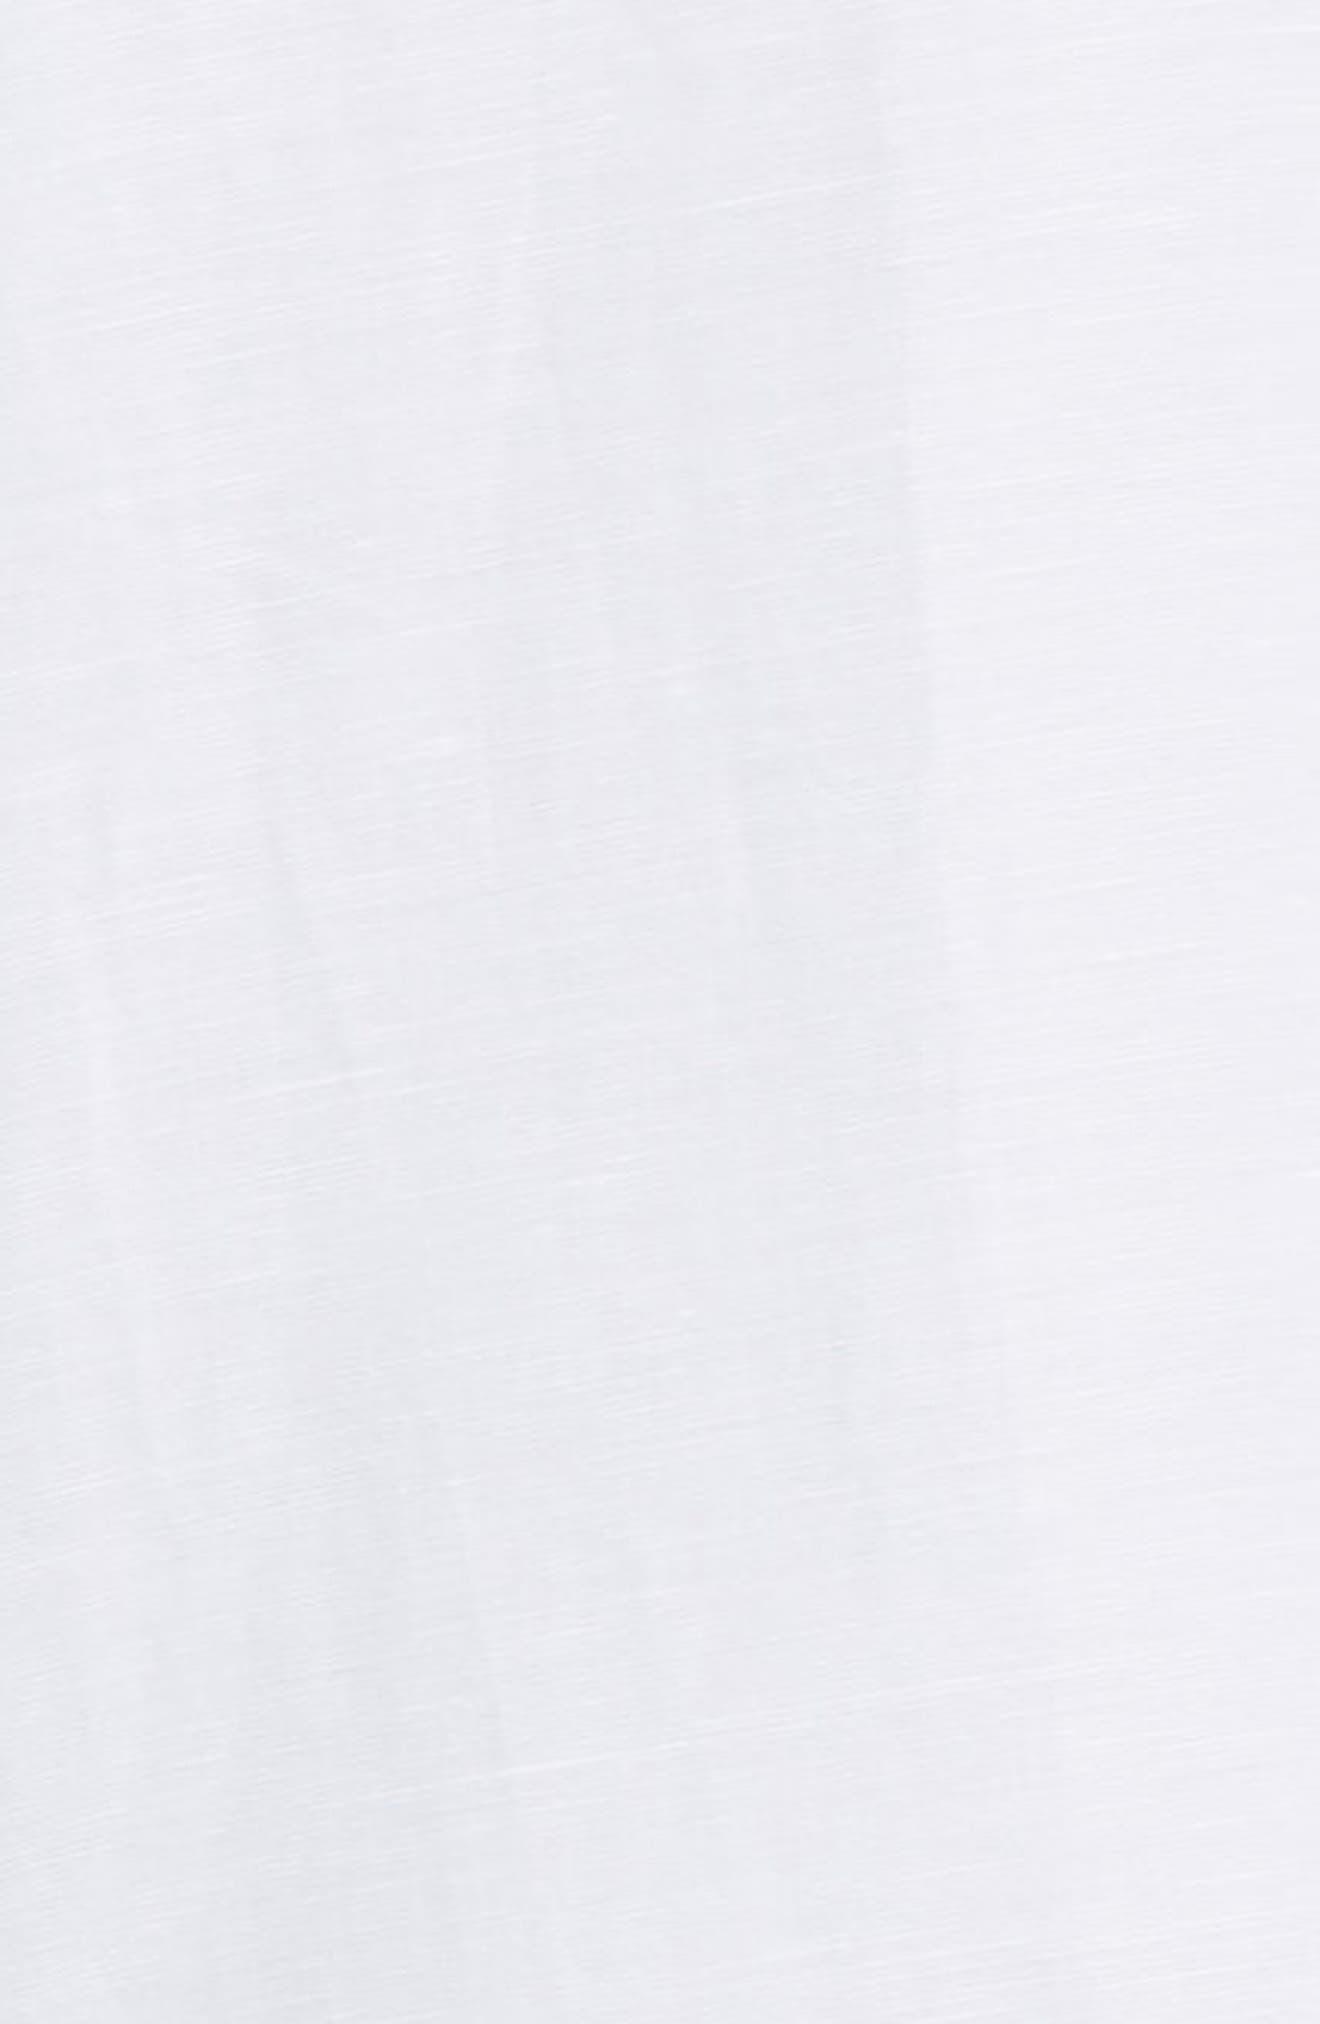 TED BAKER LONDON, Graphit Slim Fit Cotton & Linen Sport Shirt, Alternate thumbnail 6, color, GREY